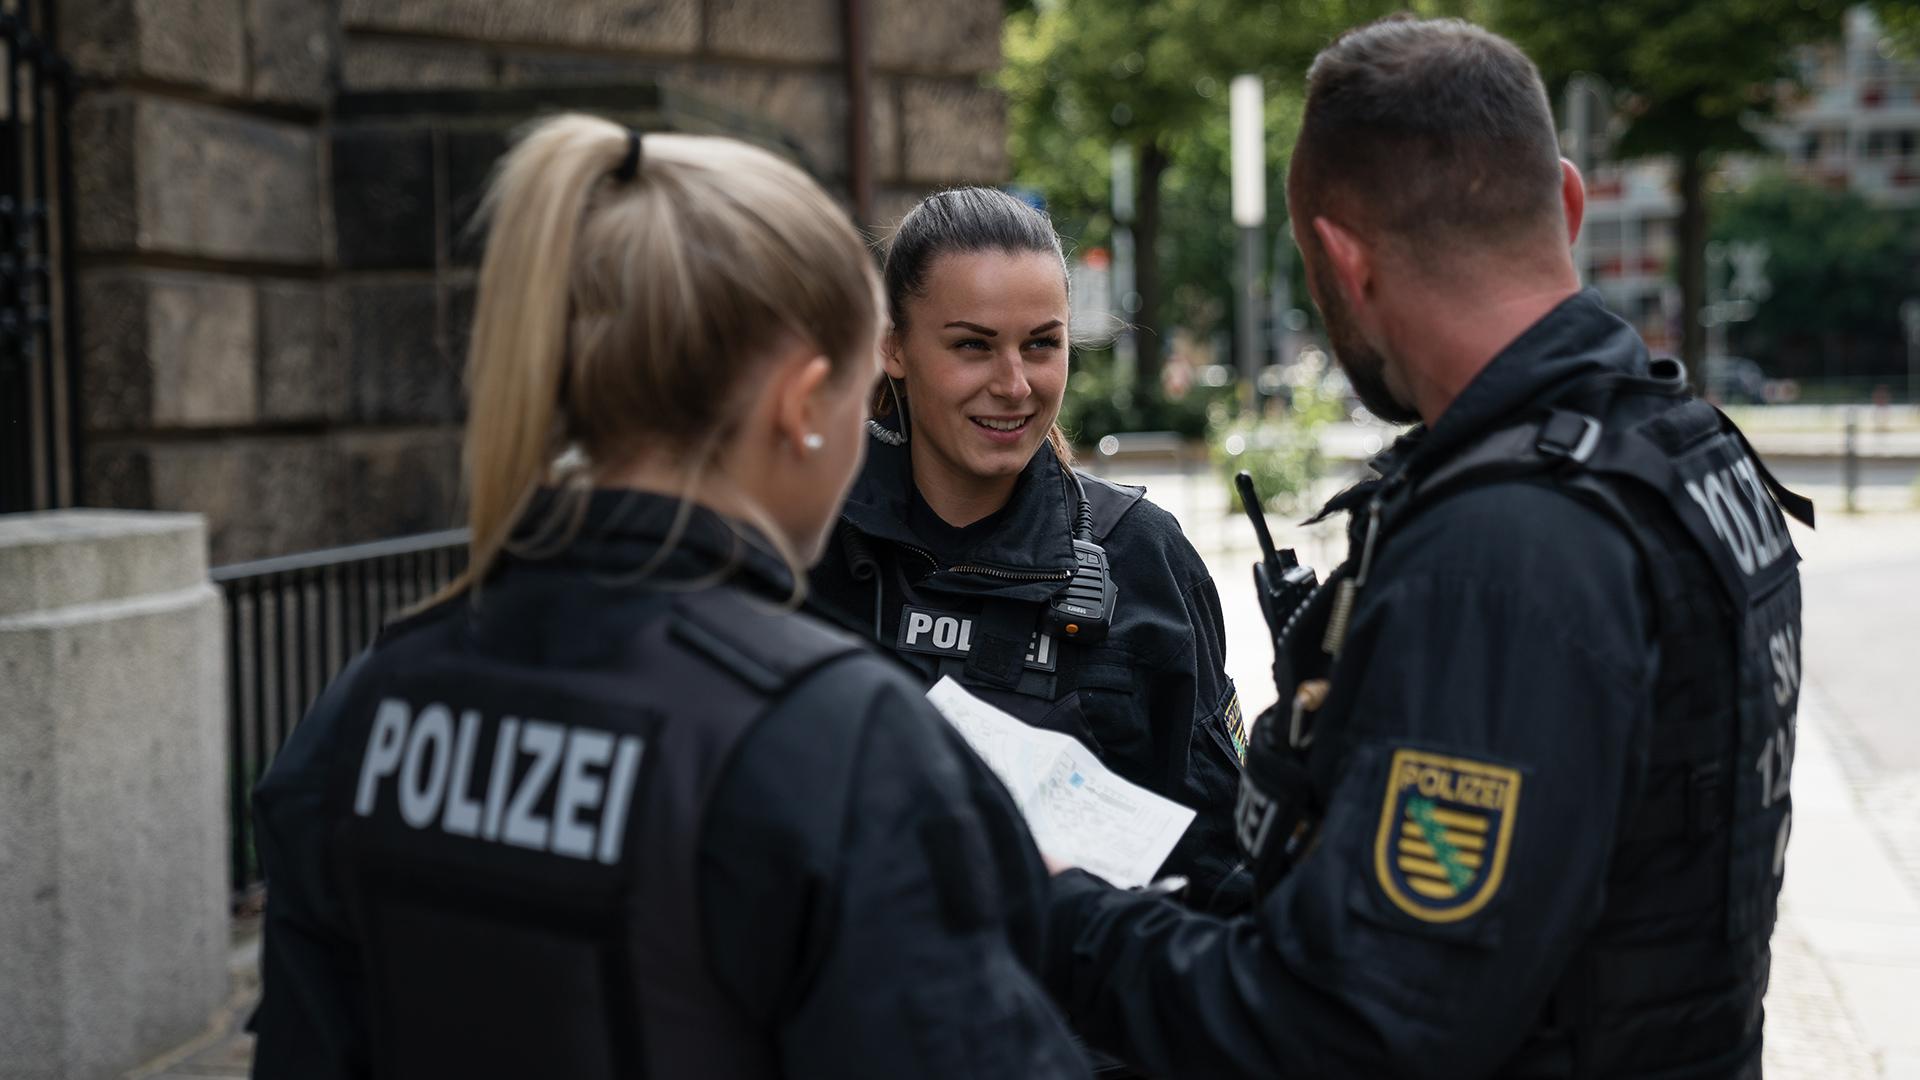 Polizei Jobs